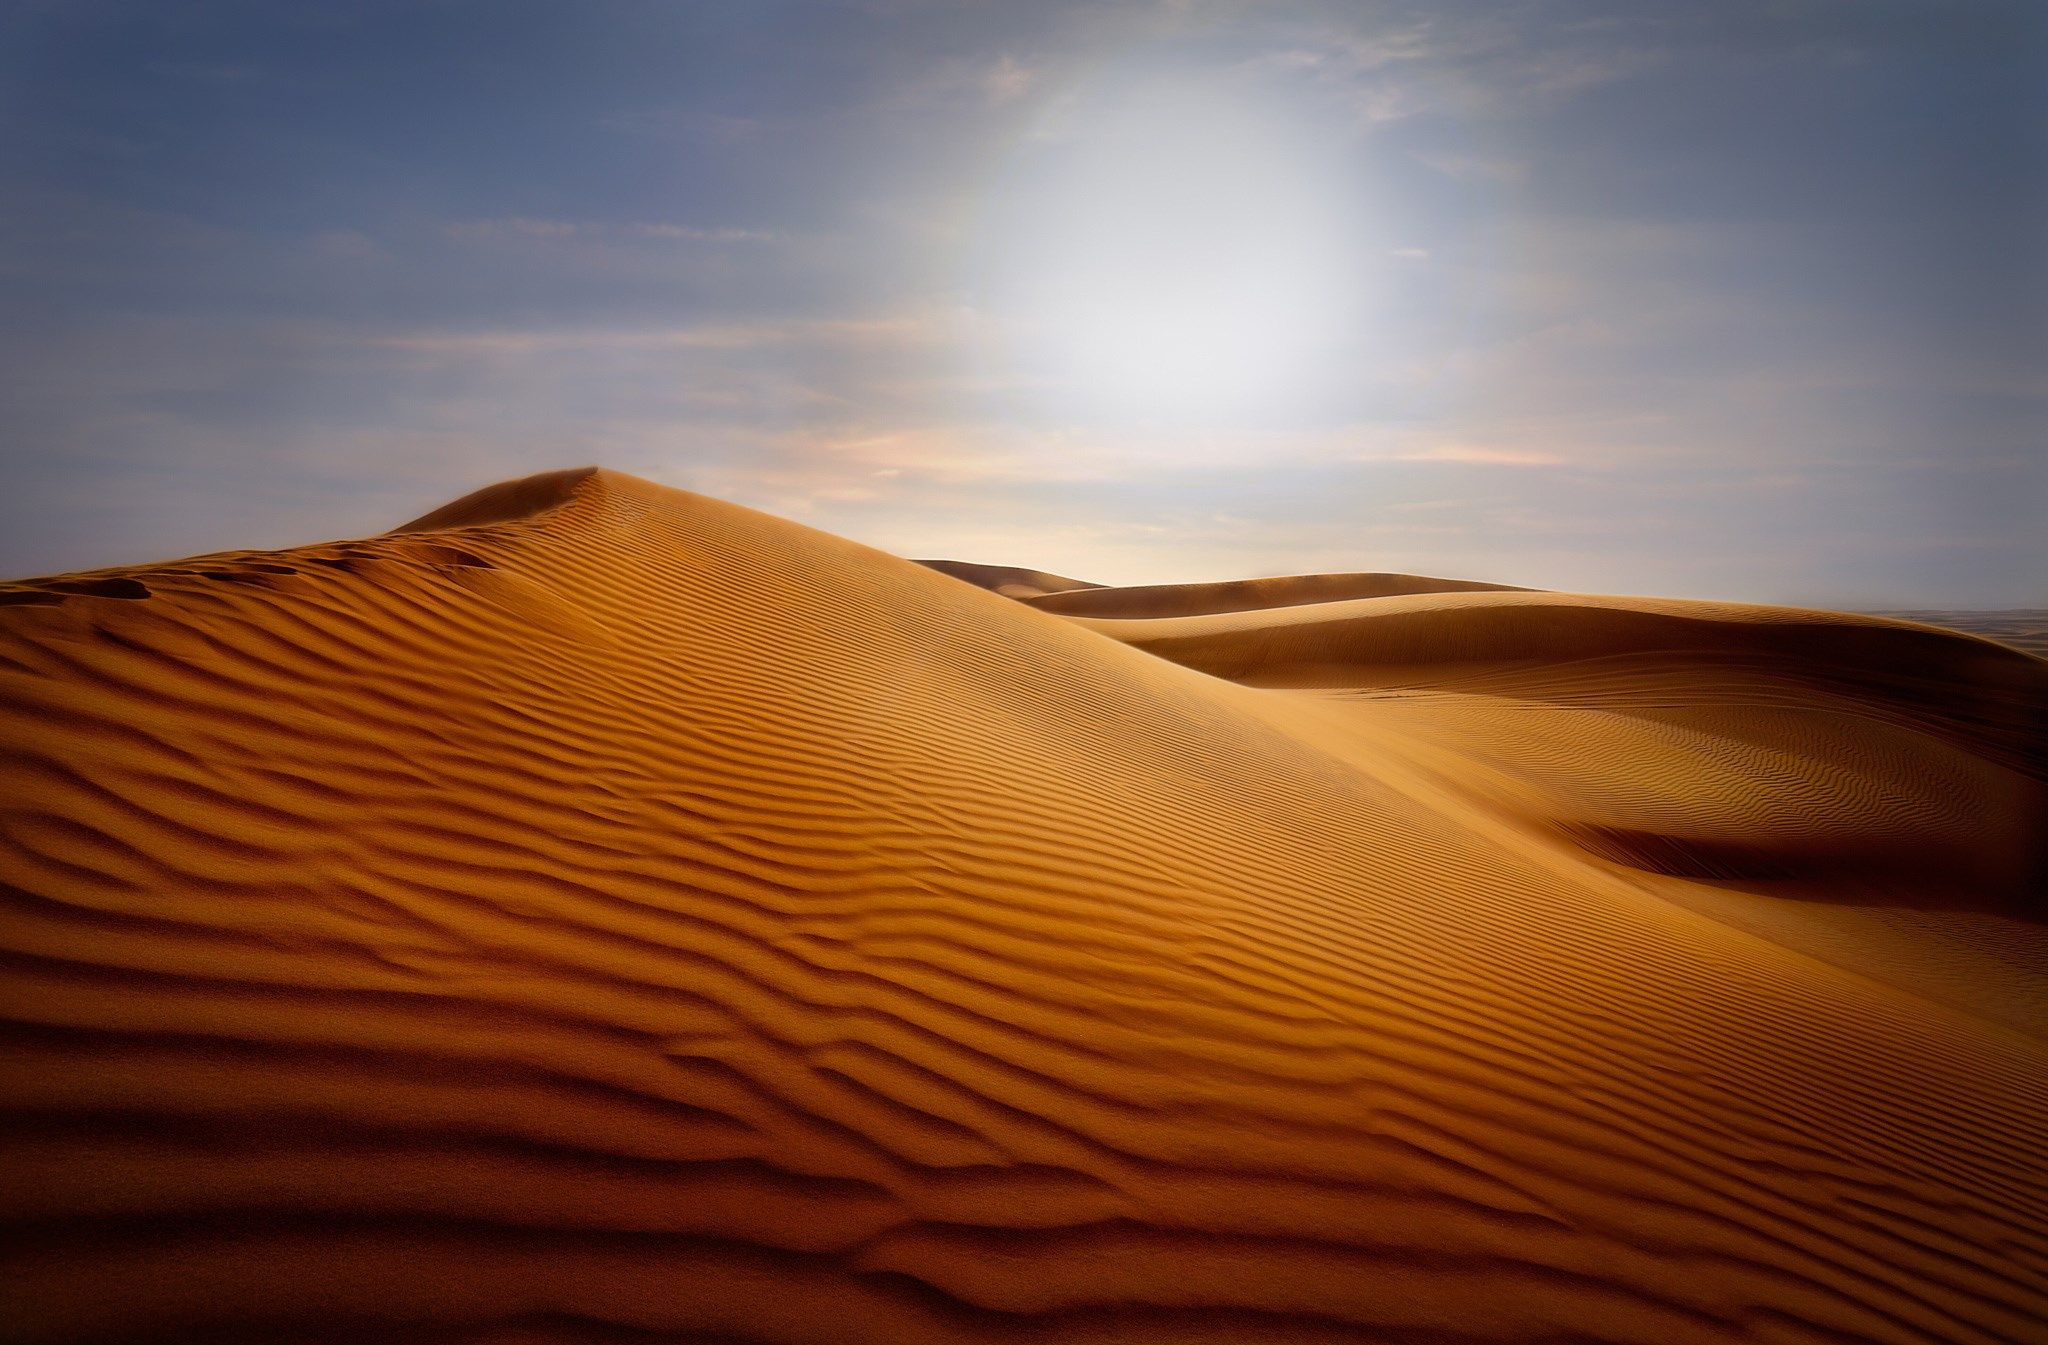 Desert 1080p High Quality Dubai Desert Beautiful World Natural